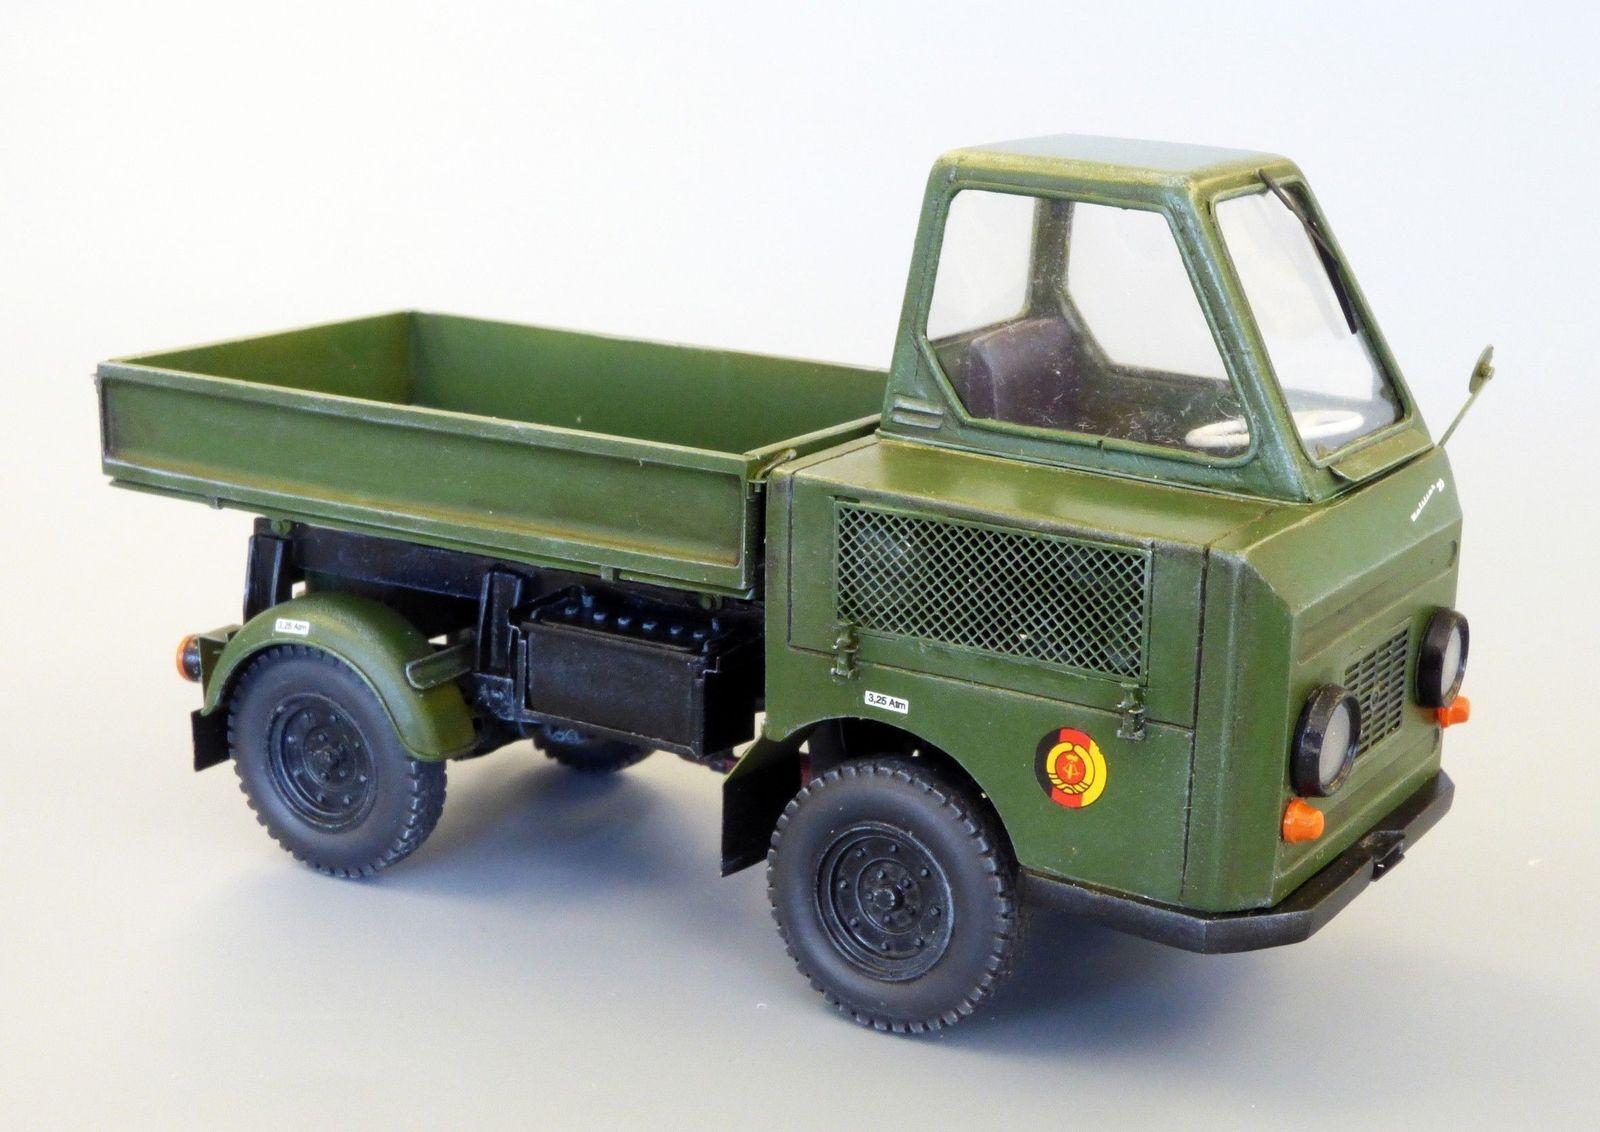 Plusmodel Multicar M-22 Modelo Kit Kit 1  3 5 Resina Art 458 Diorama